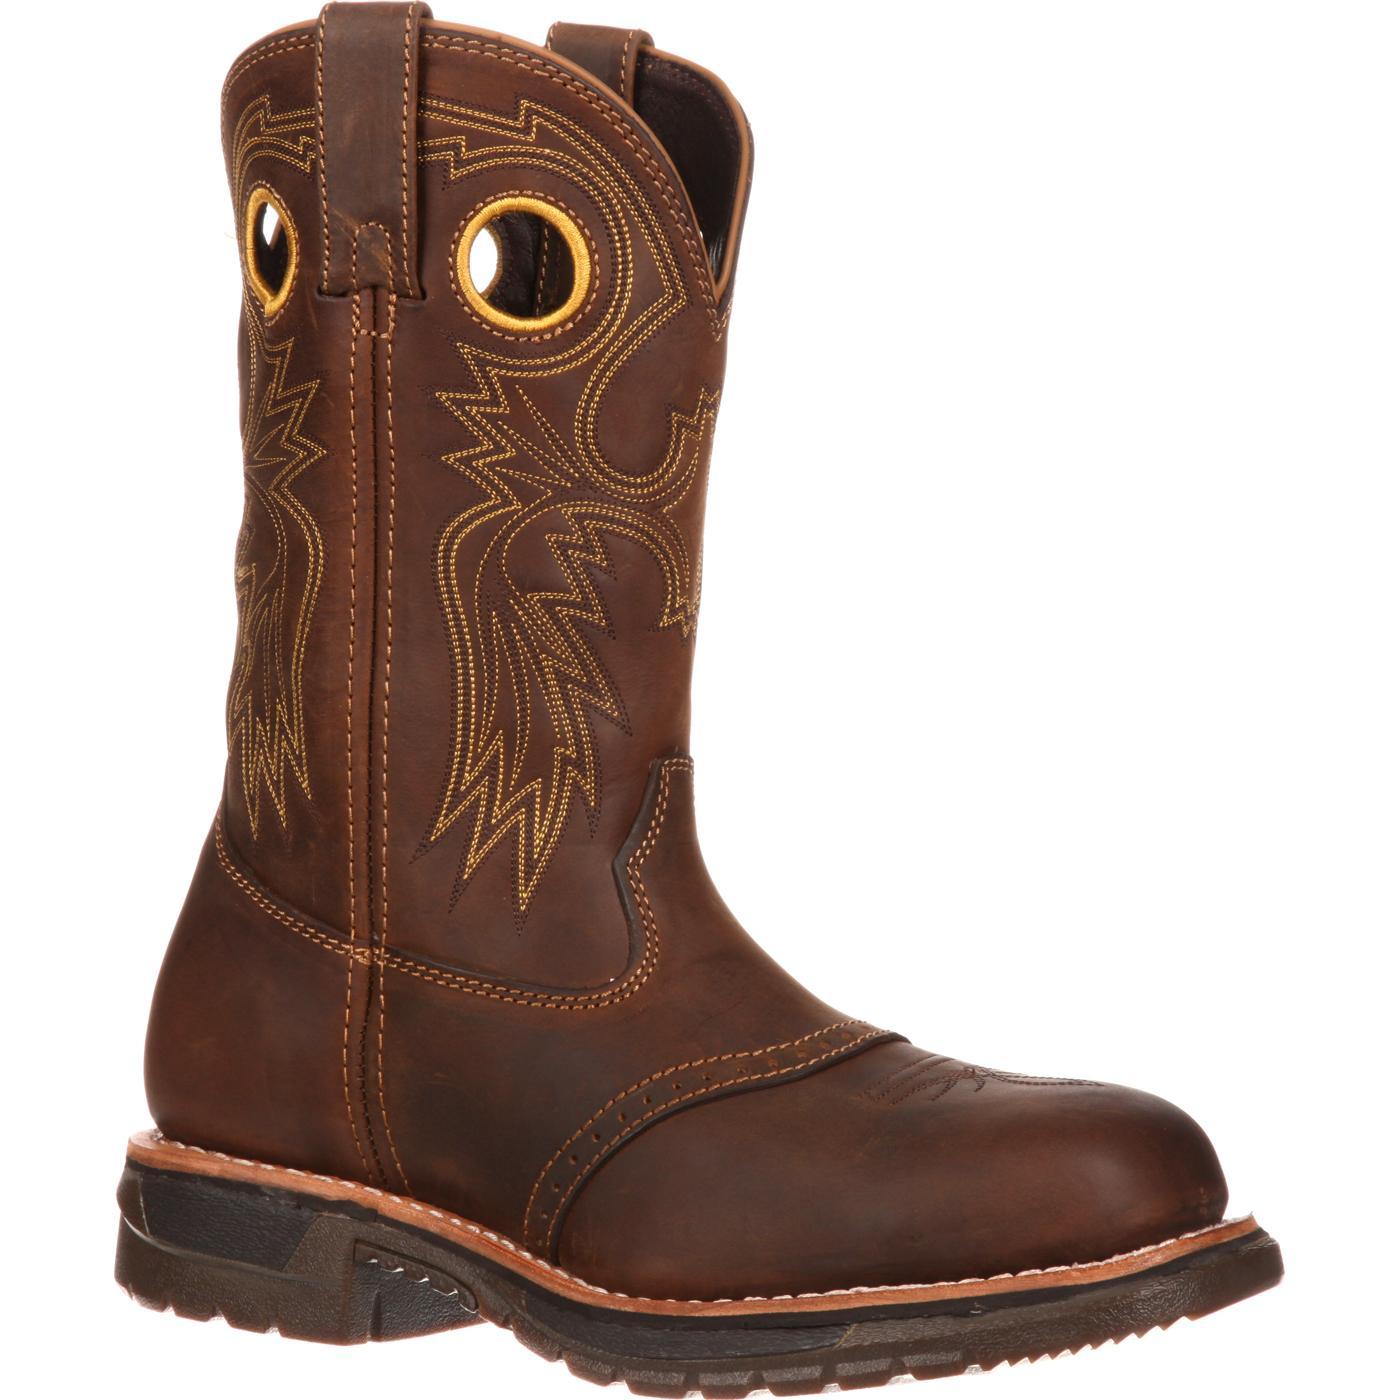 Rocky Original Ride Steel Toe Western Work Boot Fq0006029